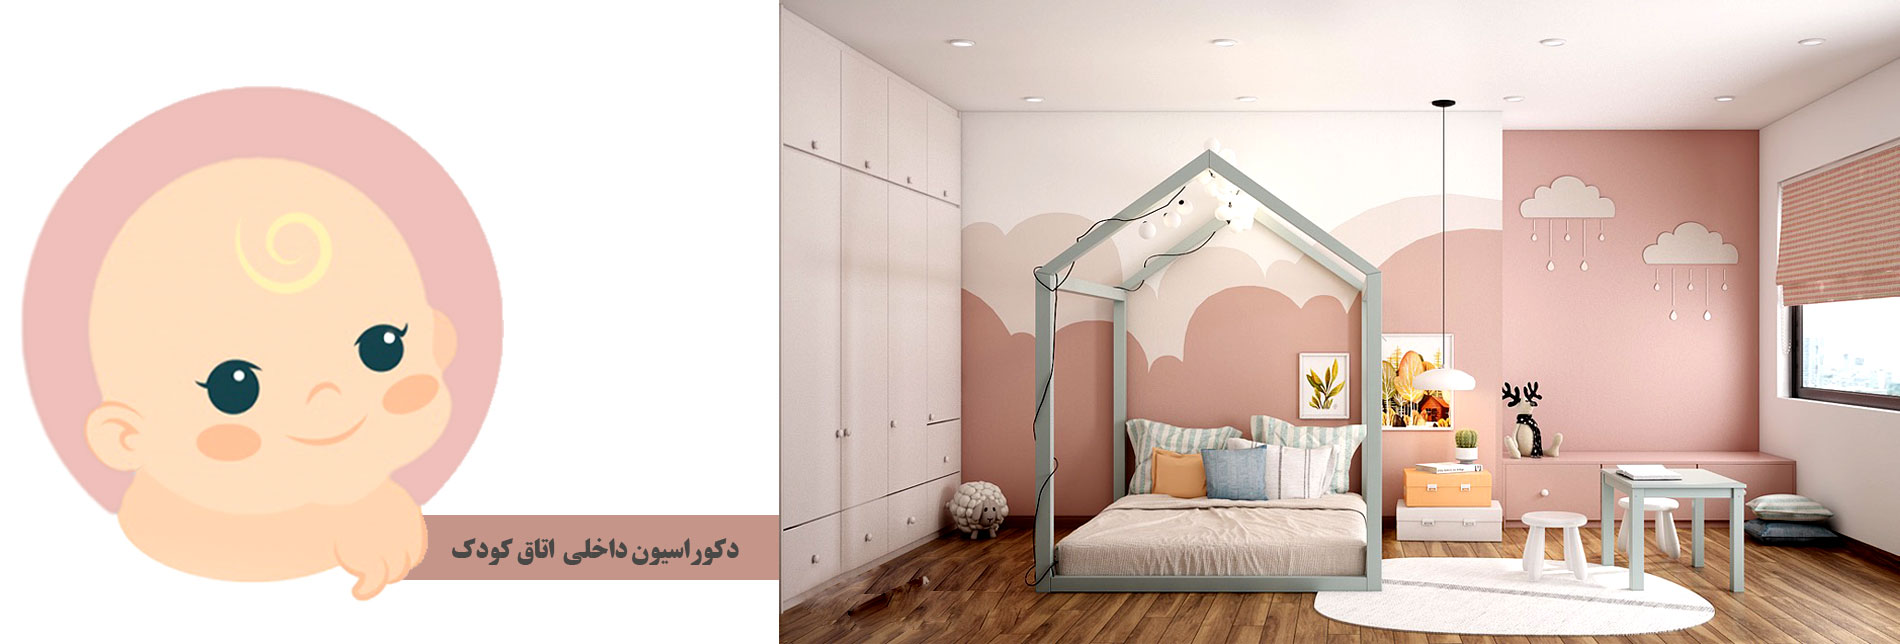 children room 2 - دکوراسیون داخلی- اتاق کودک